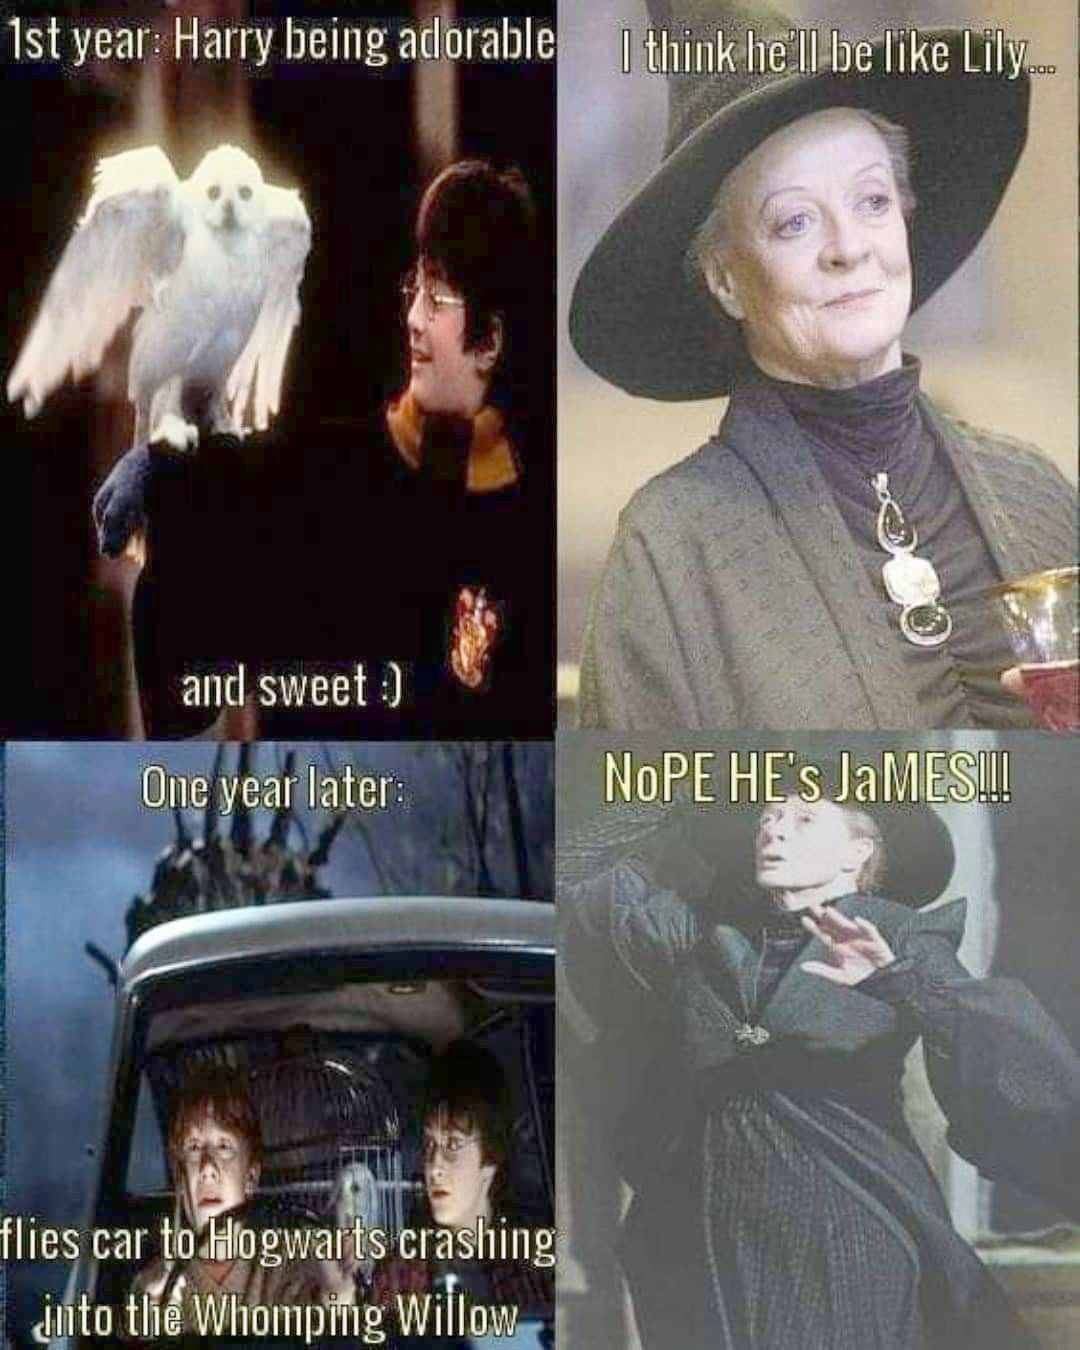 Harry Potter World Minecraft For Harry Potter Spells List All Harry Potter Movies Rotten Tomatoes Harry Potter Jokes Harry Potter Puns Harry Potter Universal